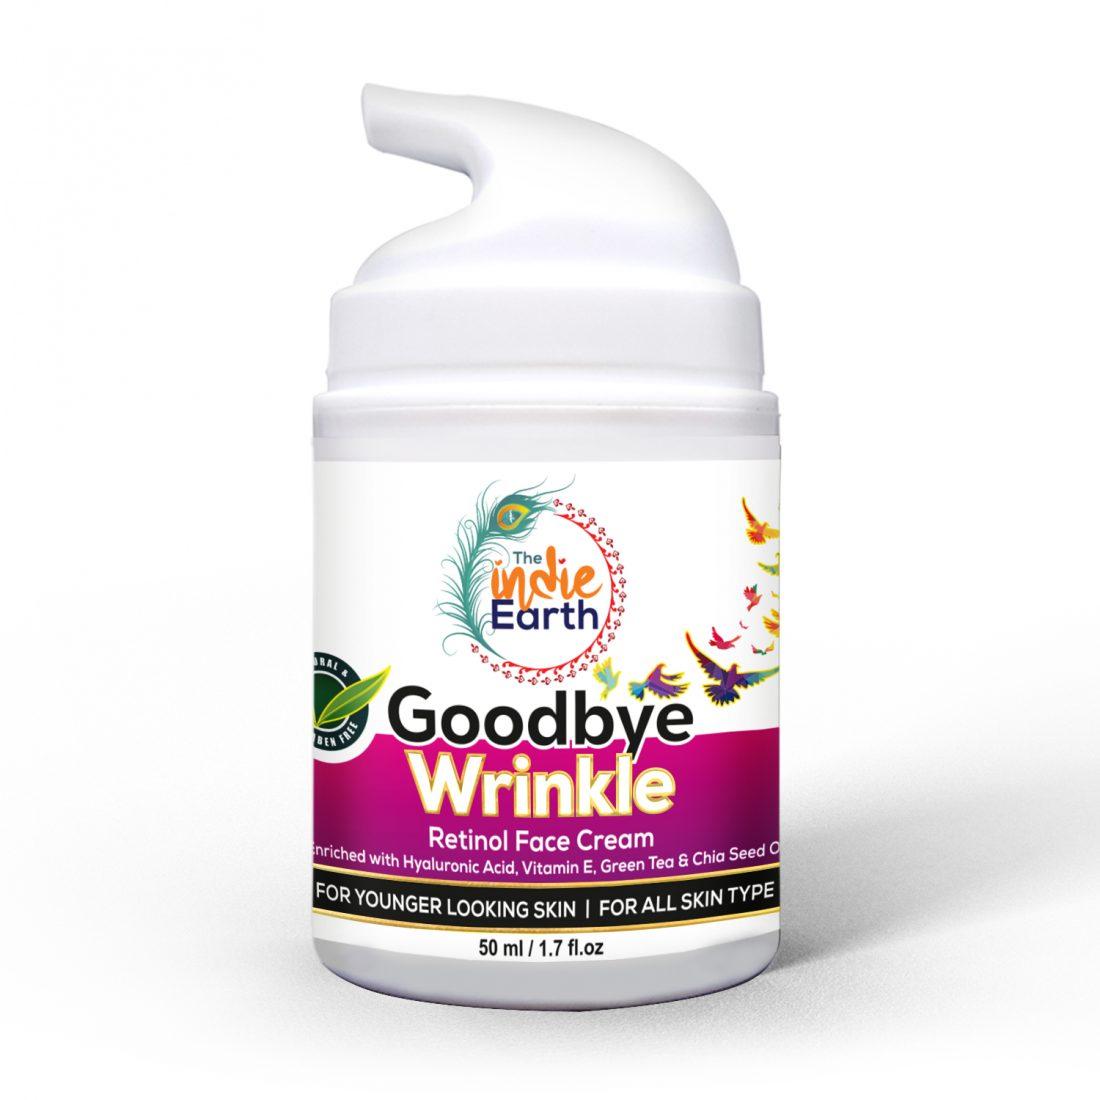 Goodbye-Wrinkle-Retinol-Face-Cream